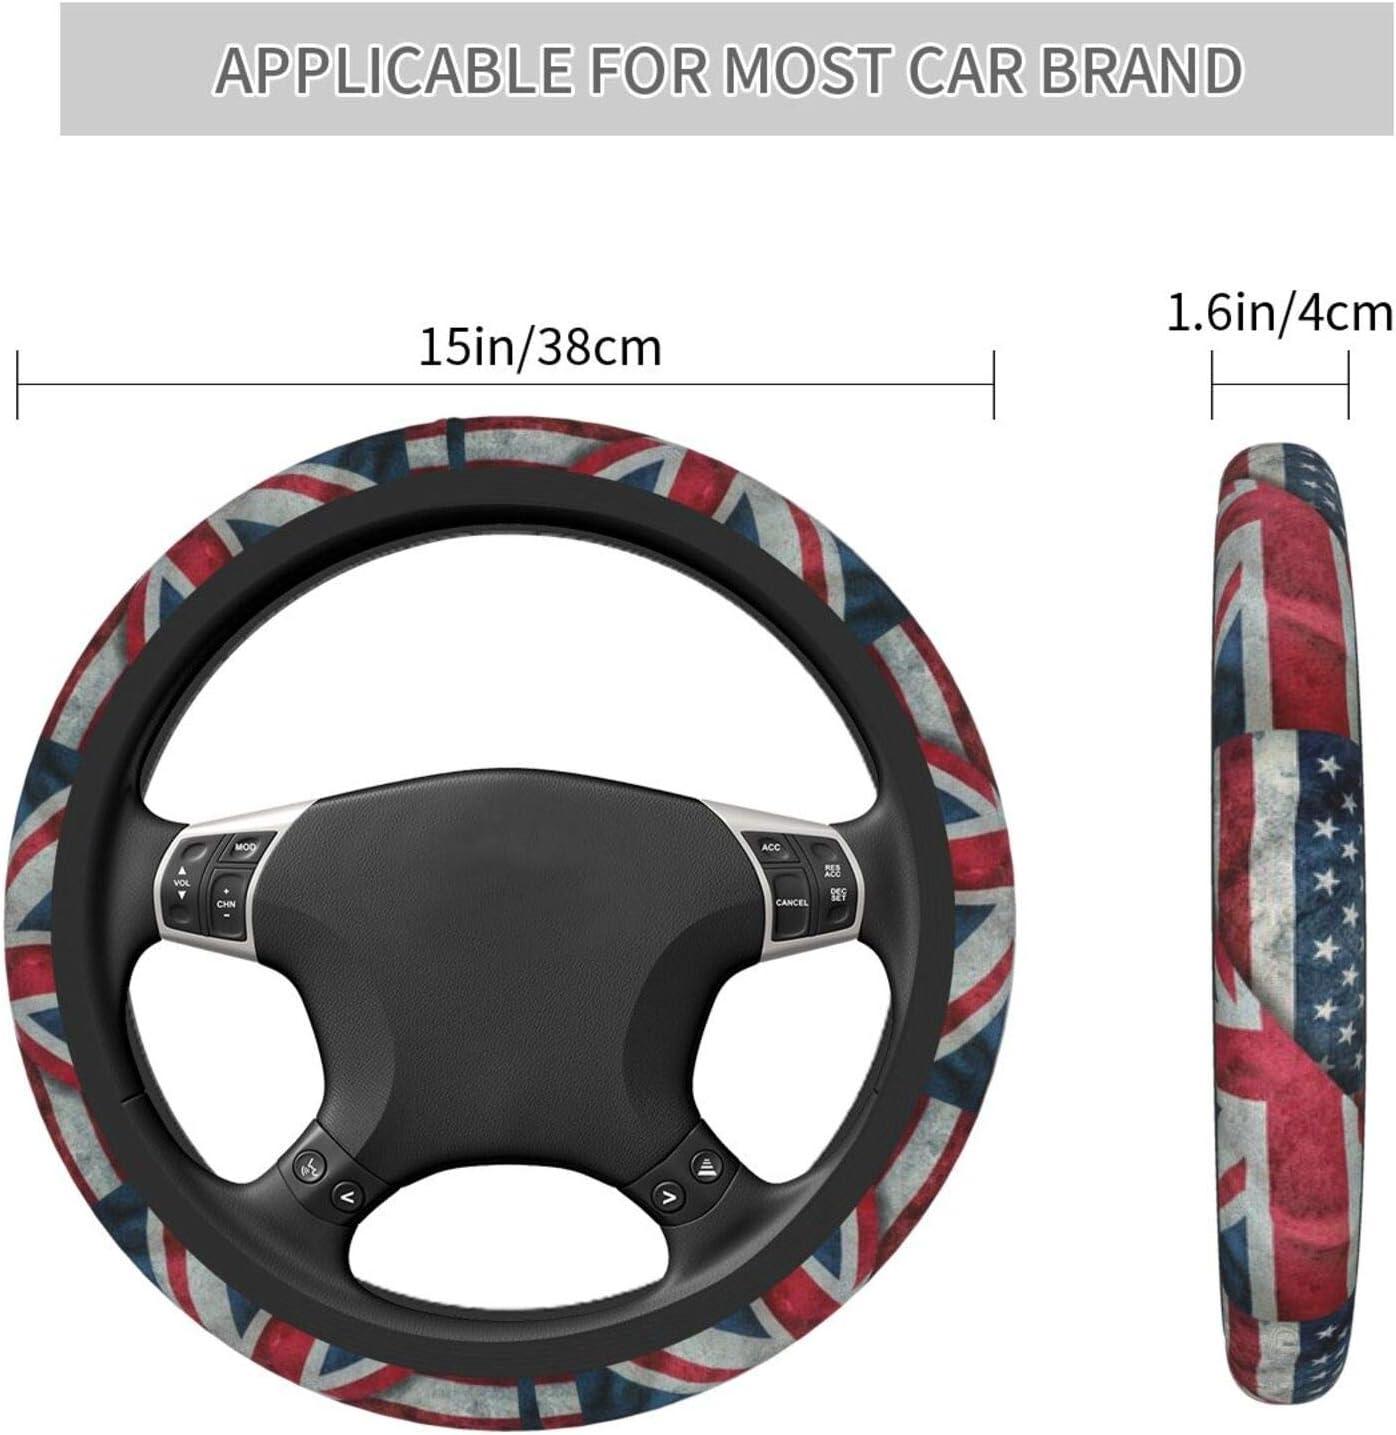 Universal 15 Inch Fit Gdewcro USA Flag and UK Union Jack Flag Auto Car Elastic Steering Wheel Cover Anti Slip Durable Odorless Neoprene Rubber Steering Wheel Protector